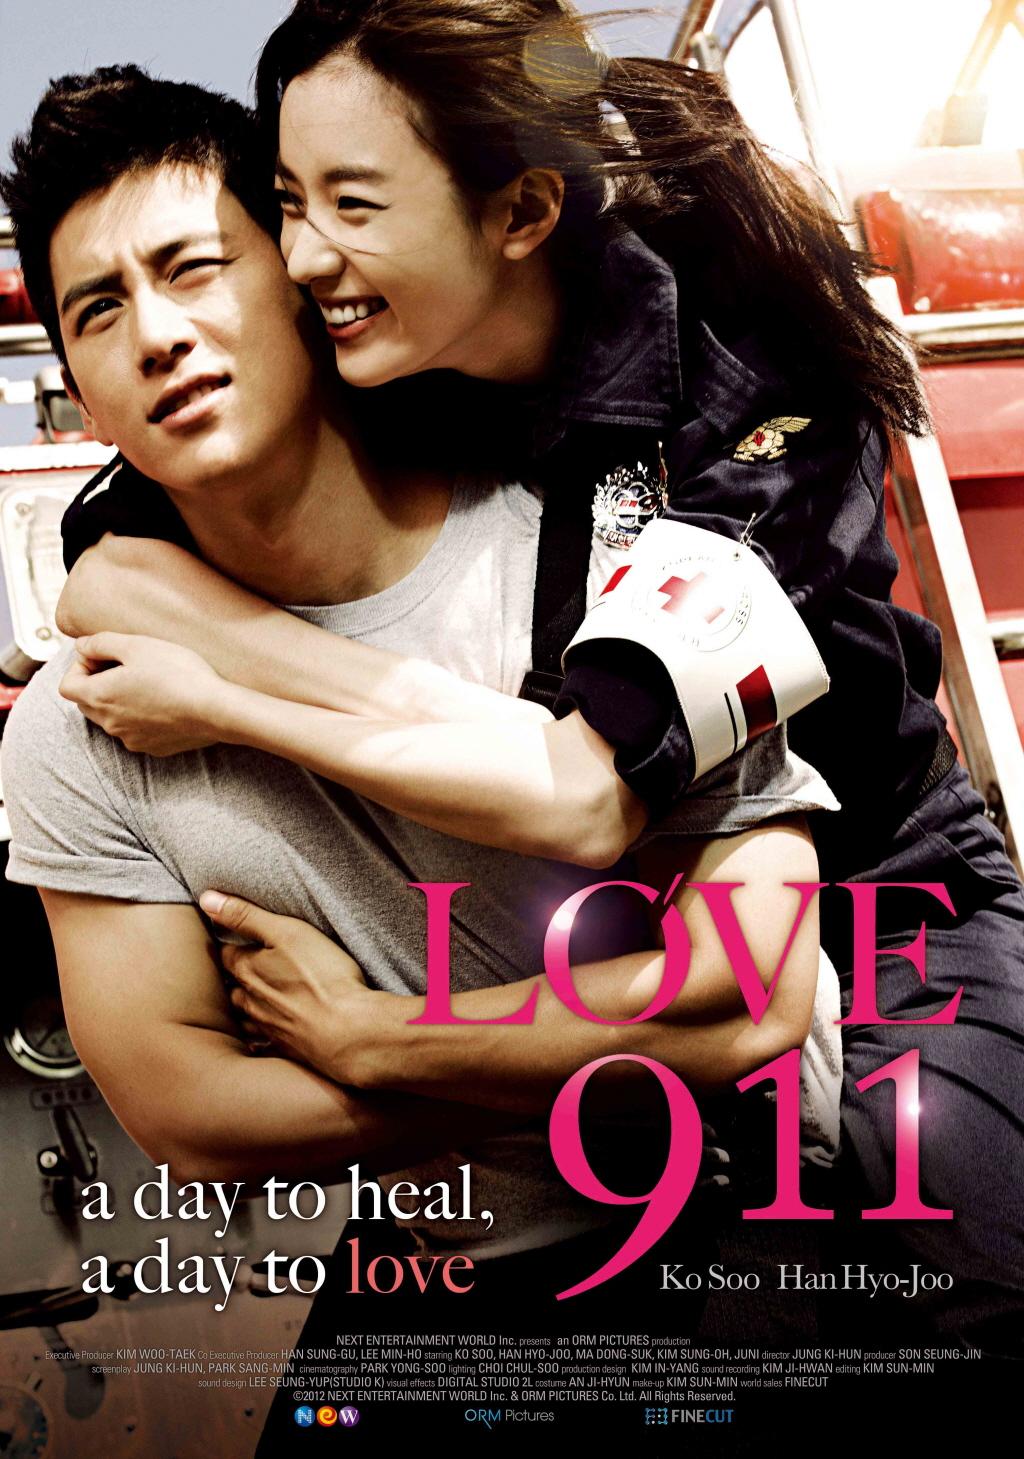 Phim Yêu Khẩn Cấp - Love 911 - Wallpaper